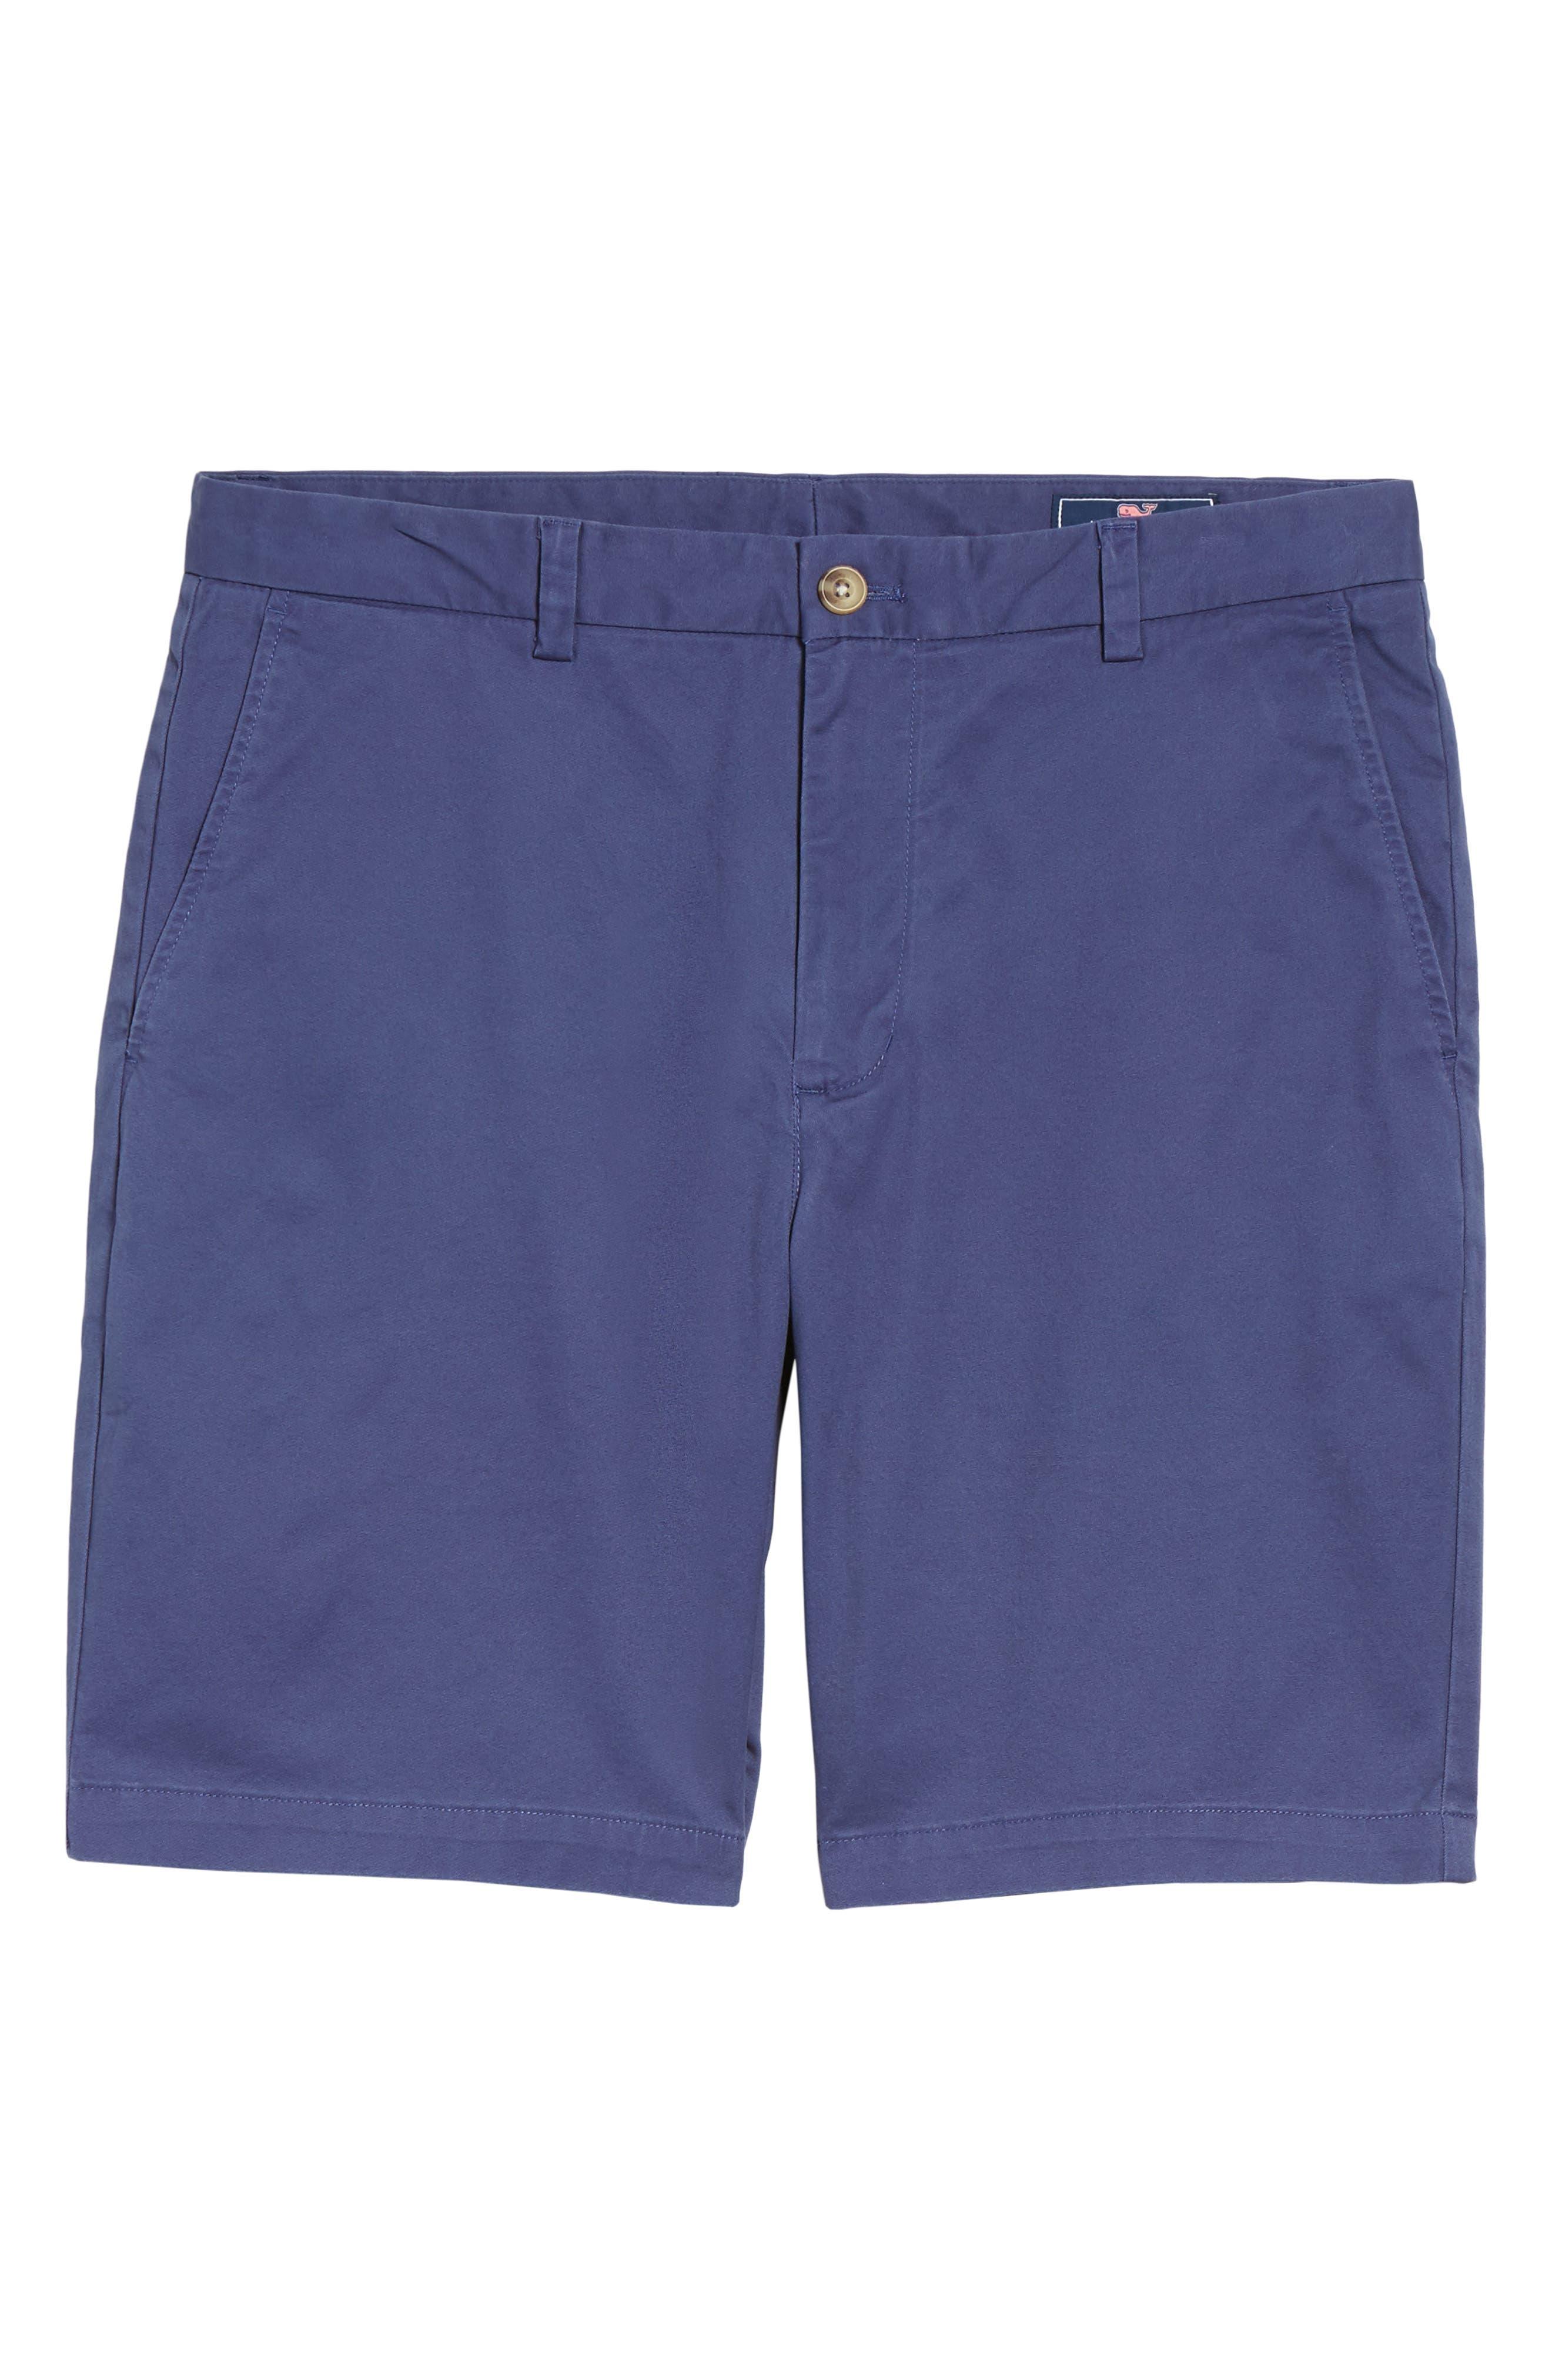 9 Inch Stretch Breaker Shorts,                             Alternate thumbnail 128, color,